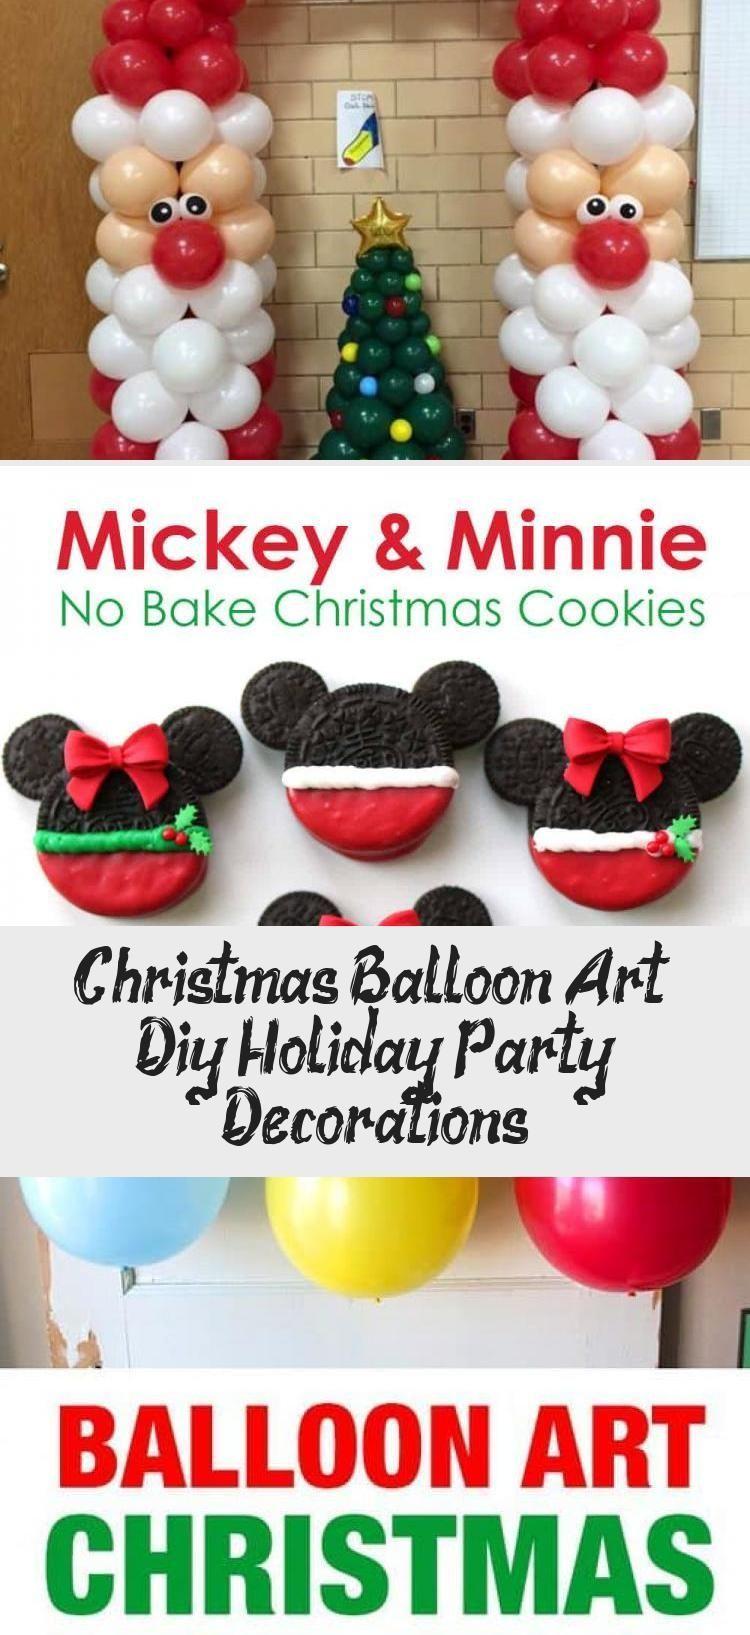 Creative ideas for Christmas Balloon Art! Fun DIY Holiday Decorations that turn ...,  #art #B...,  #art #Balloon #Christmas #CREATIVE #Decorations #DIY #Fun #Holiday #holidaydecorationsminimalist #Ideas #turn